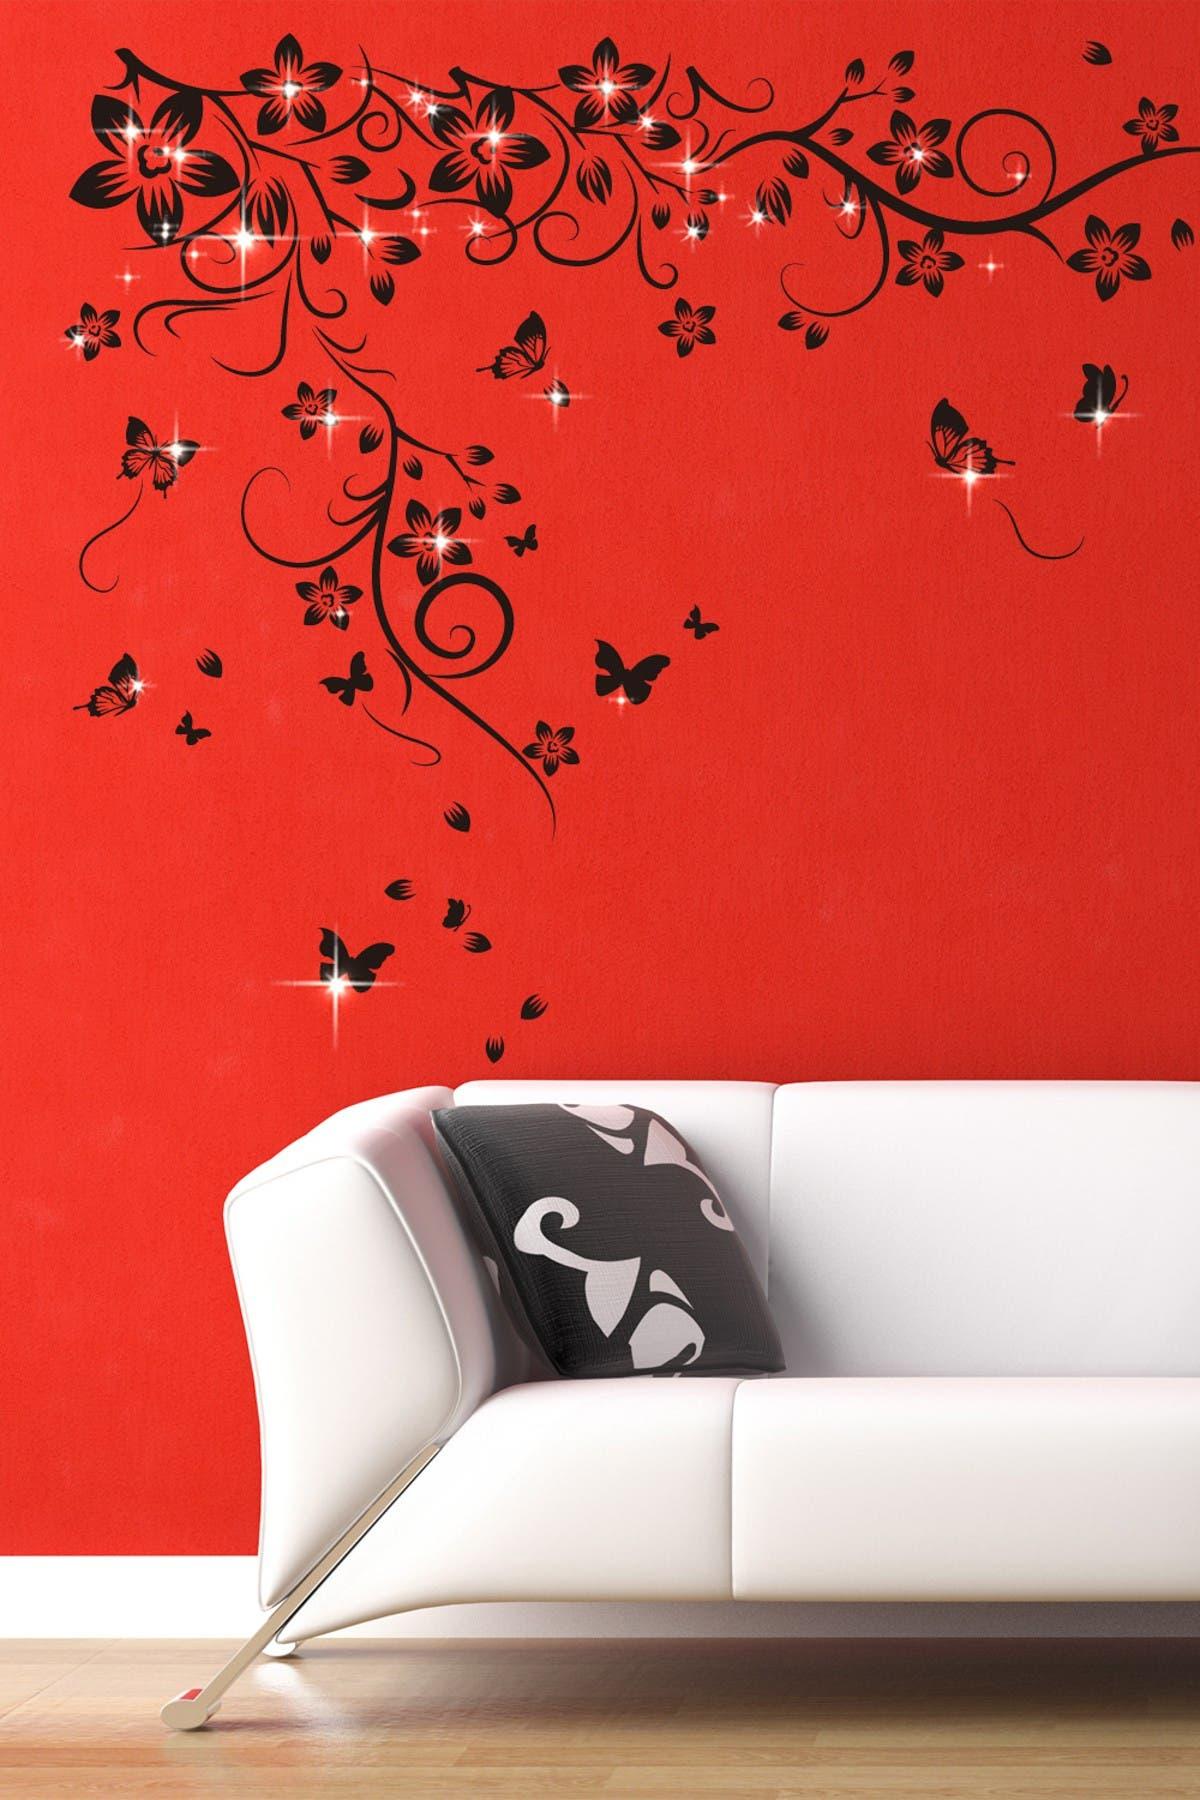 Image of WalPlus Black Swarovski Crystal Embellished Butterfly Vine Wall Sticker